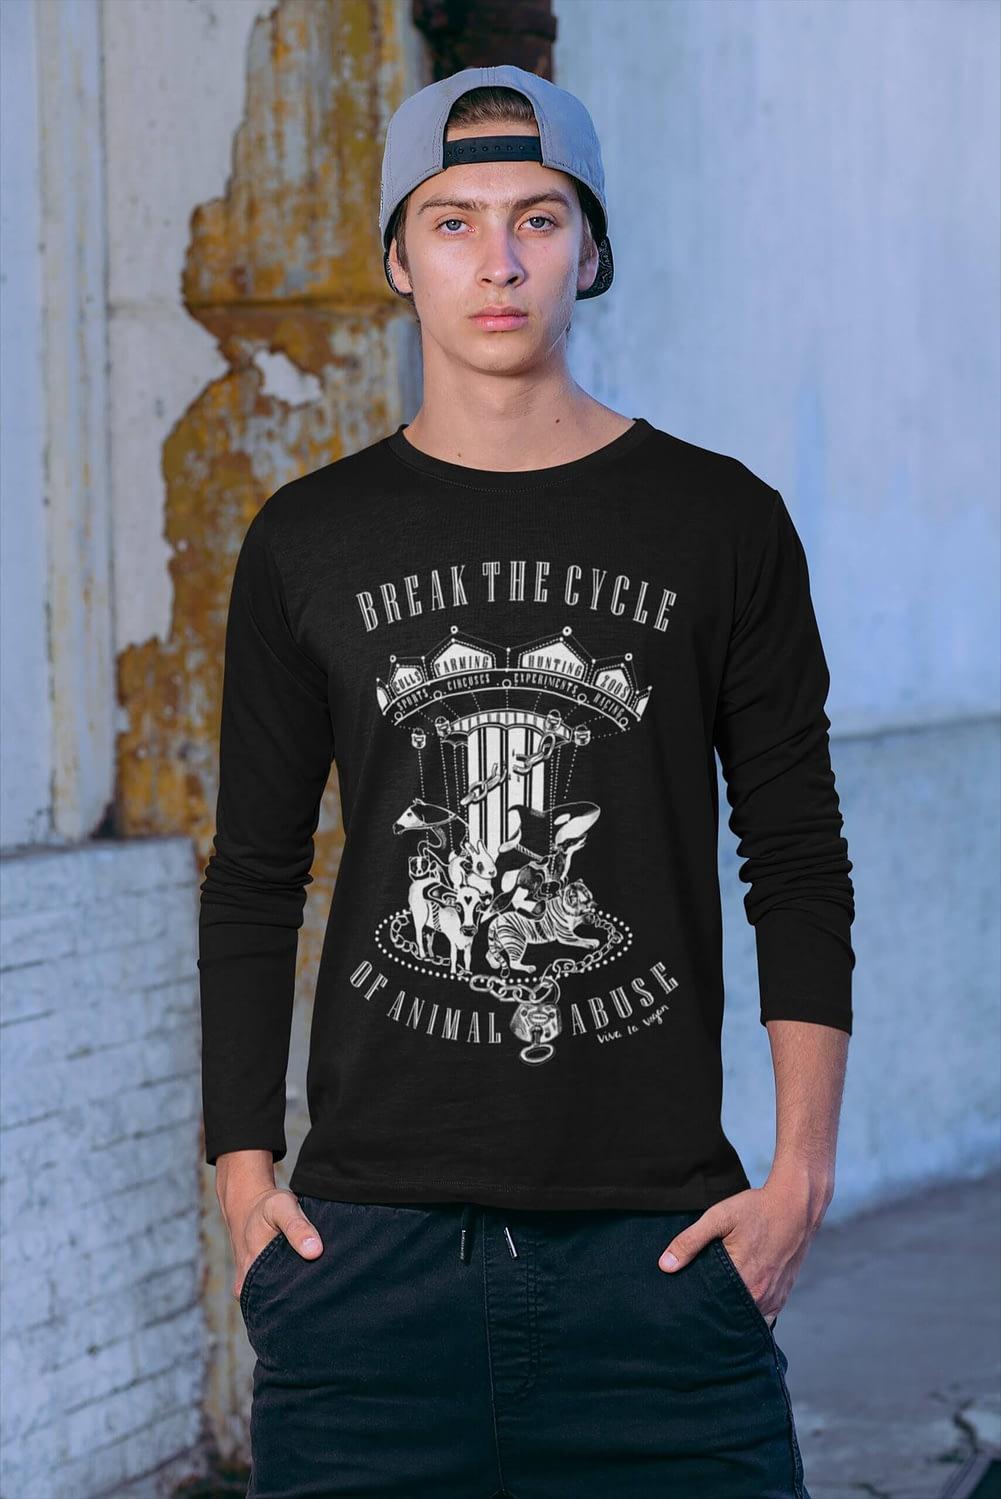 Unisex longsleeve tshirt. Break the cycle of animal abuse by eco-ethical brand Viva La Vegan